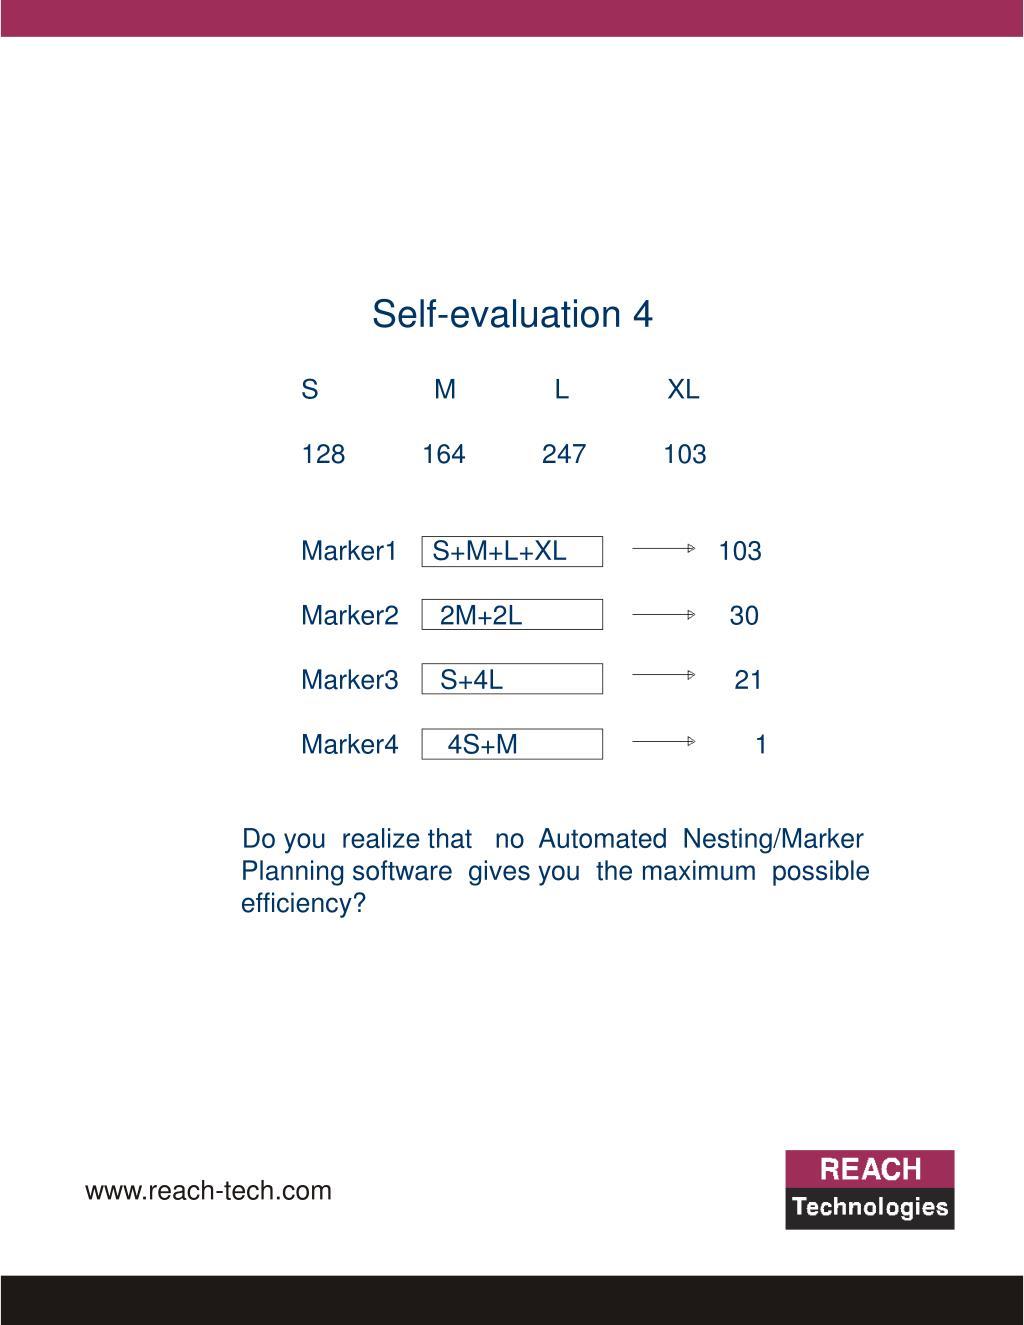 Self-evaluation 4